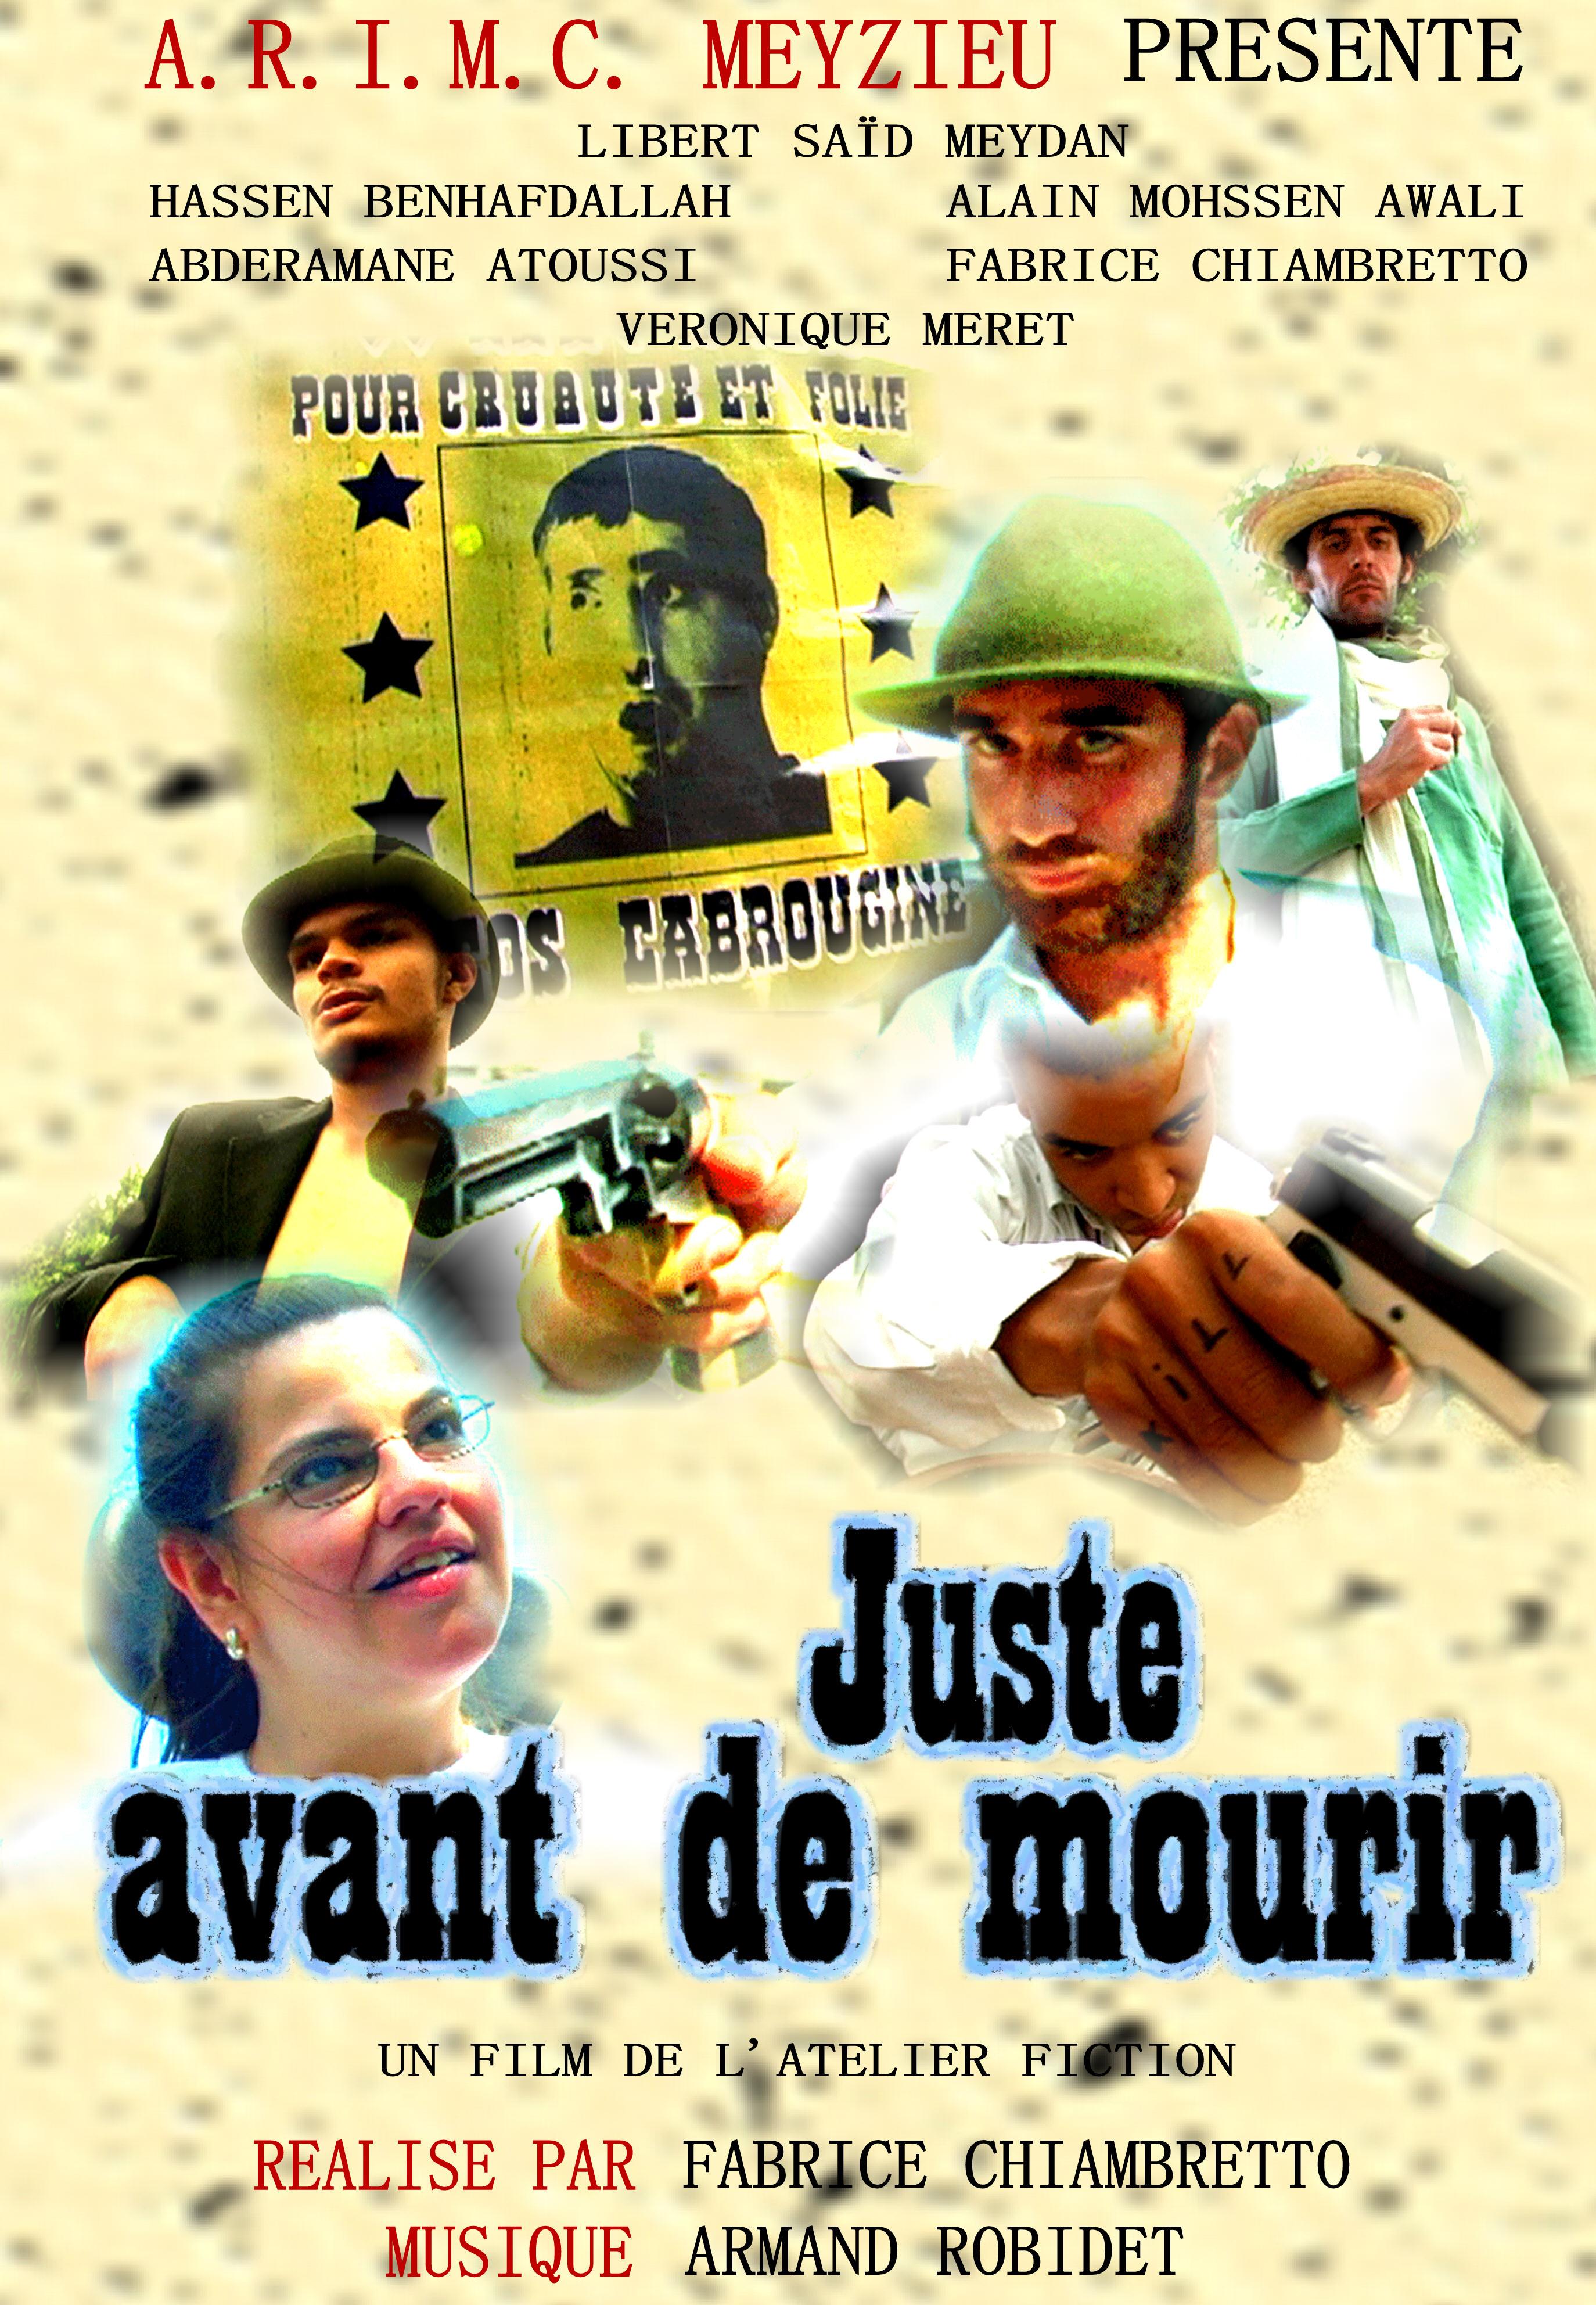 ARIMC_-_Juste_avant_de_mourir-1479379537.jpg